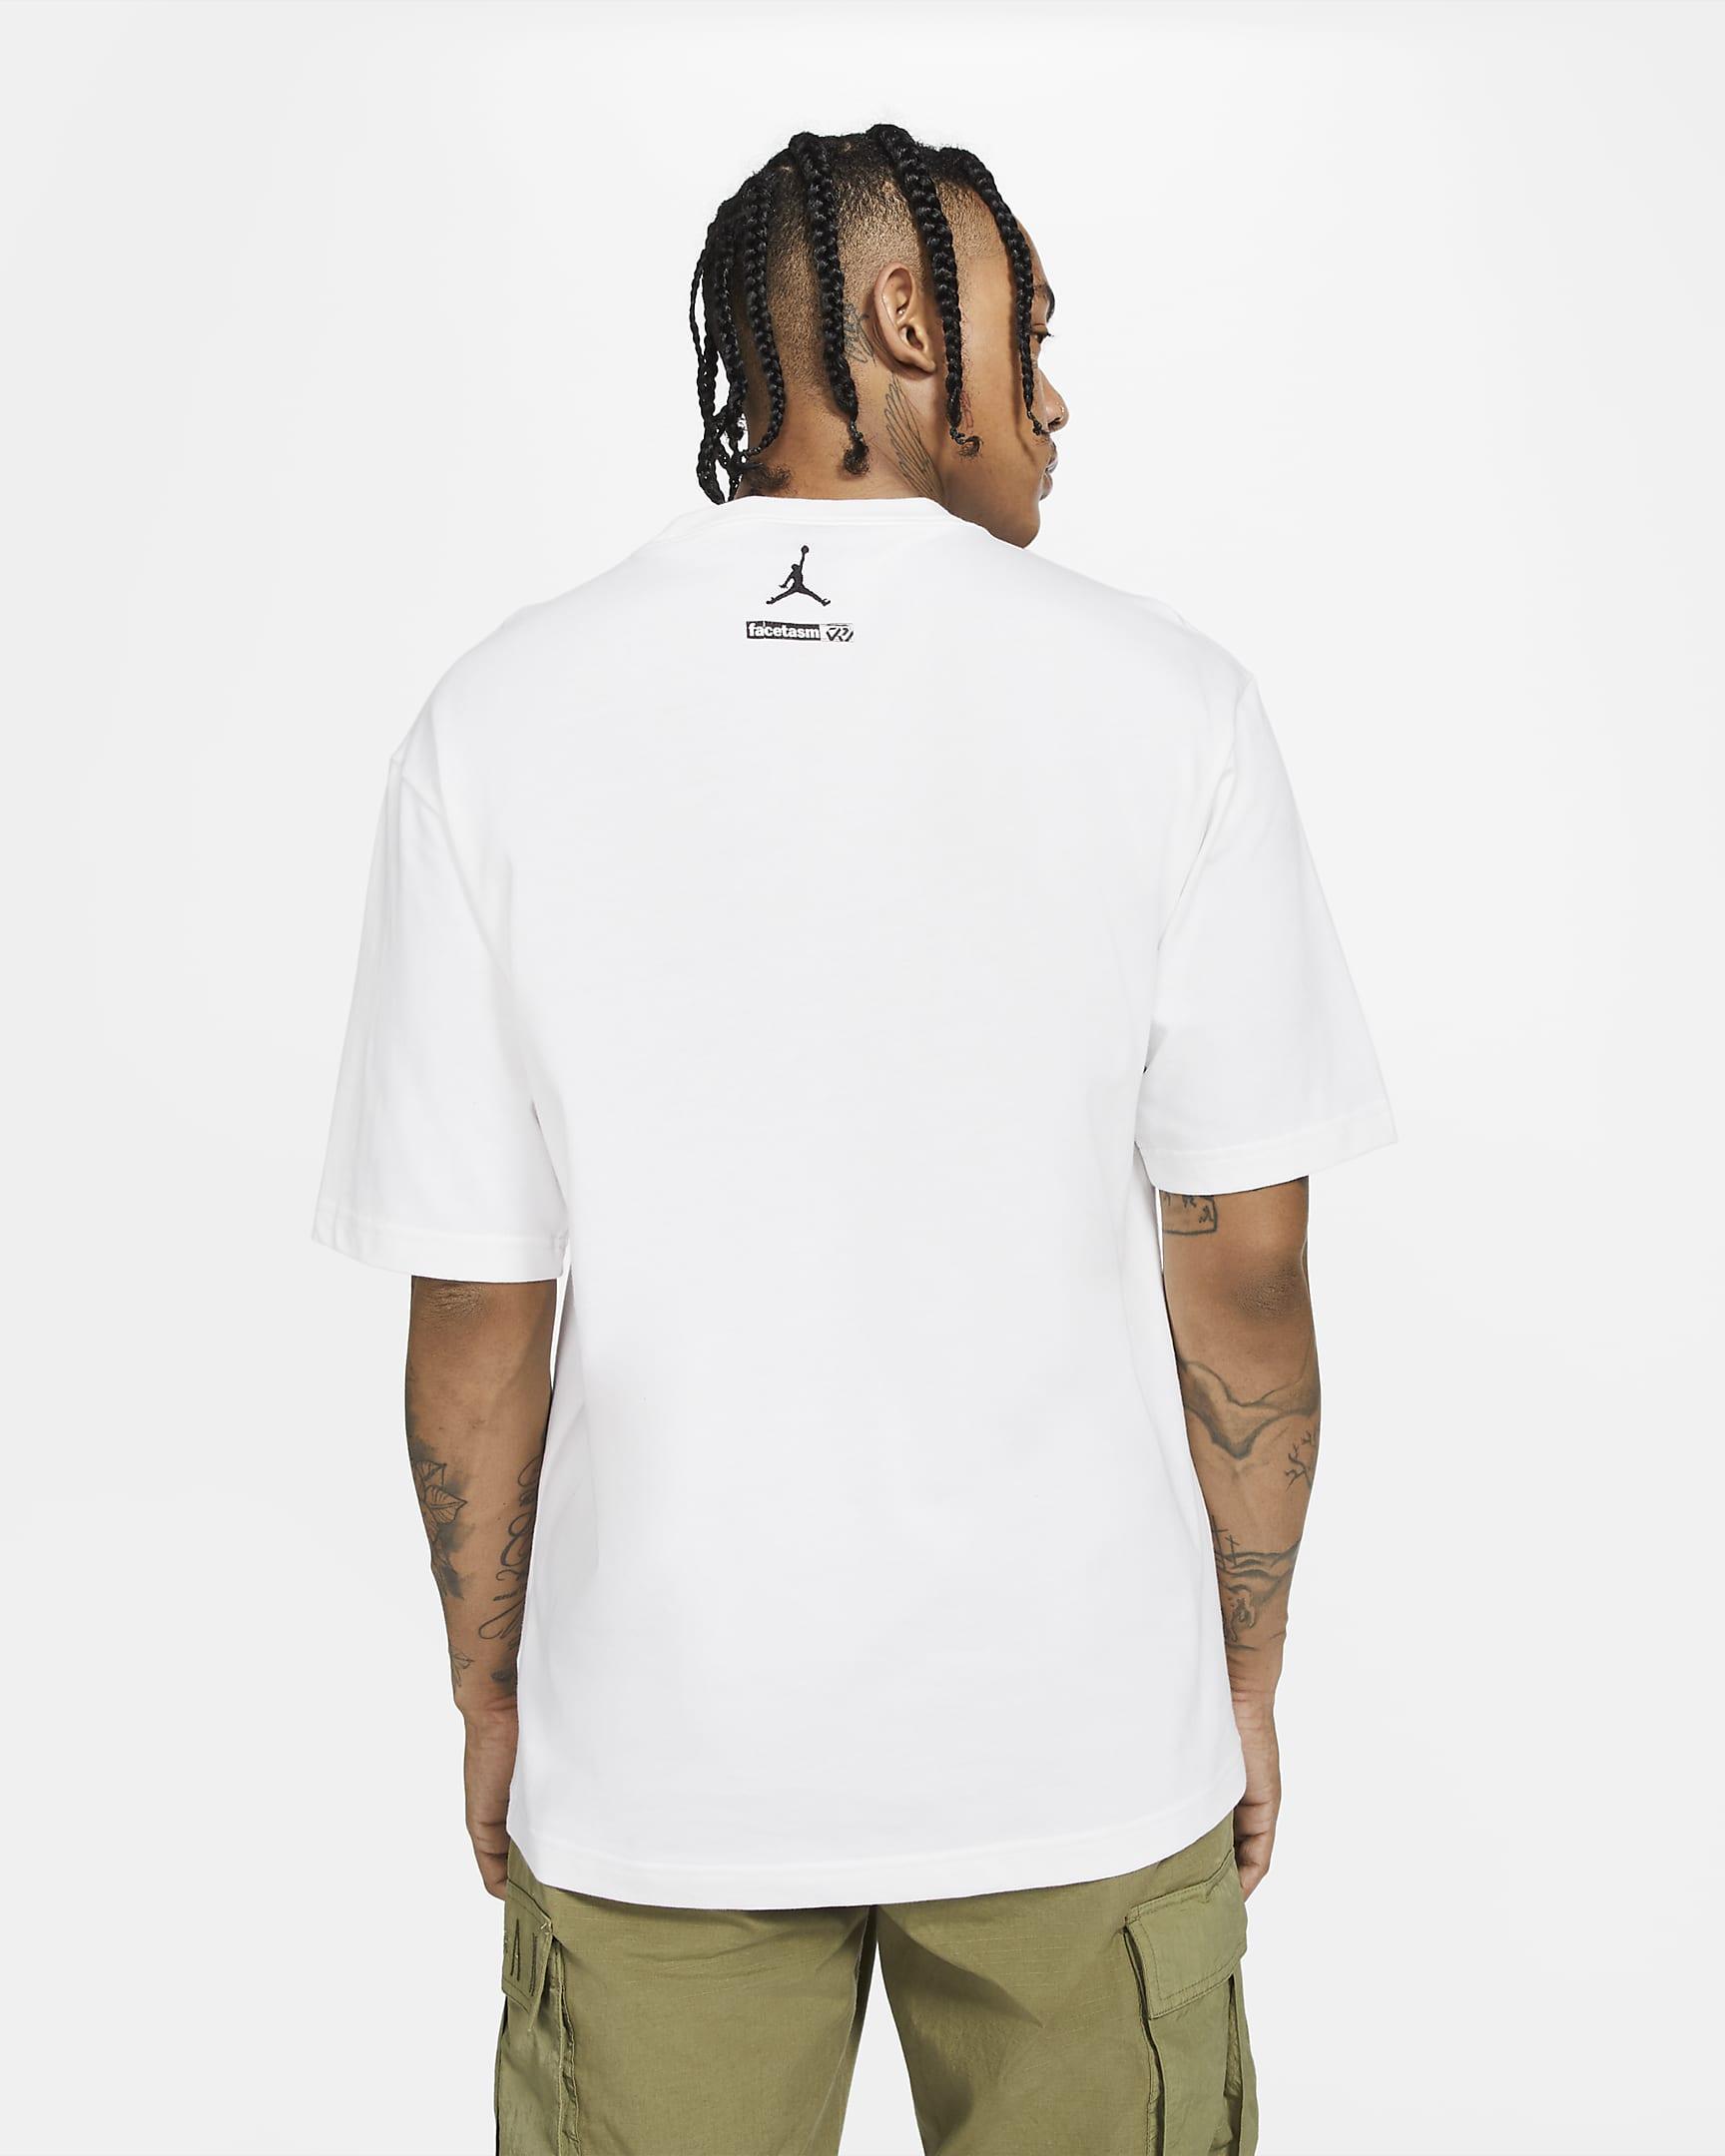 jordan-why-not-x-facetasm-mens-short-sleeve-t-shirt-0vQxFQ-1